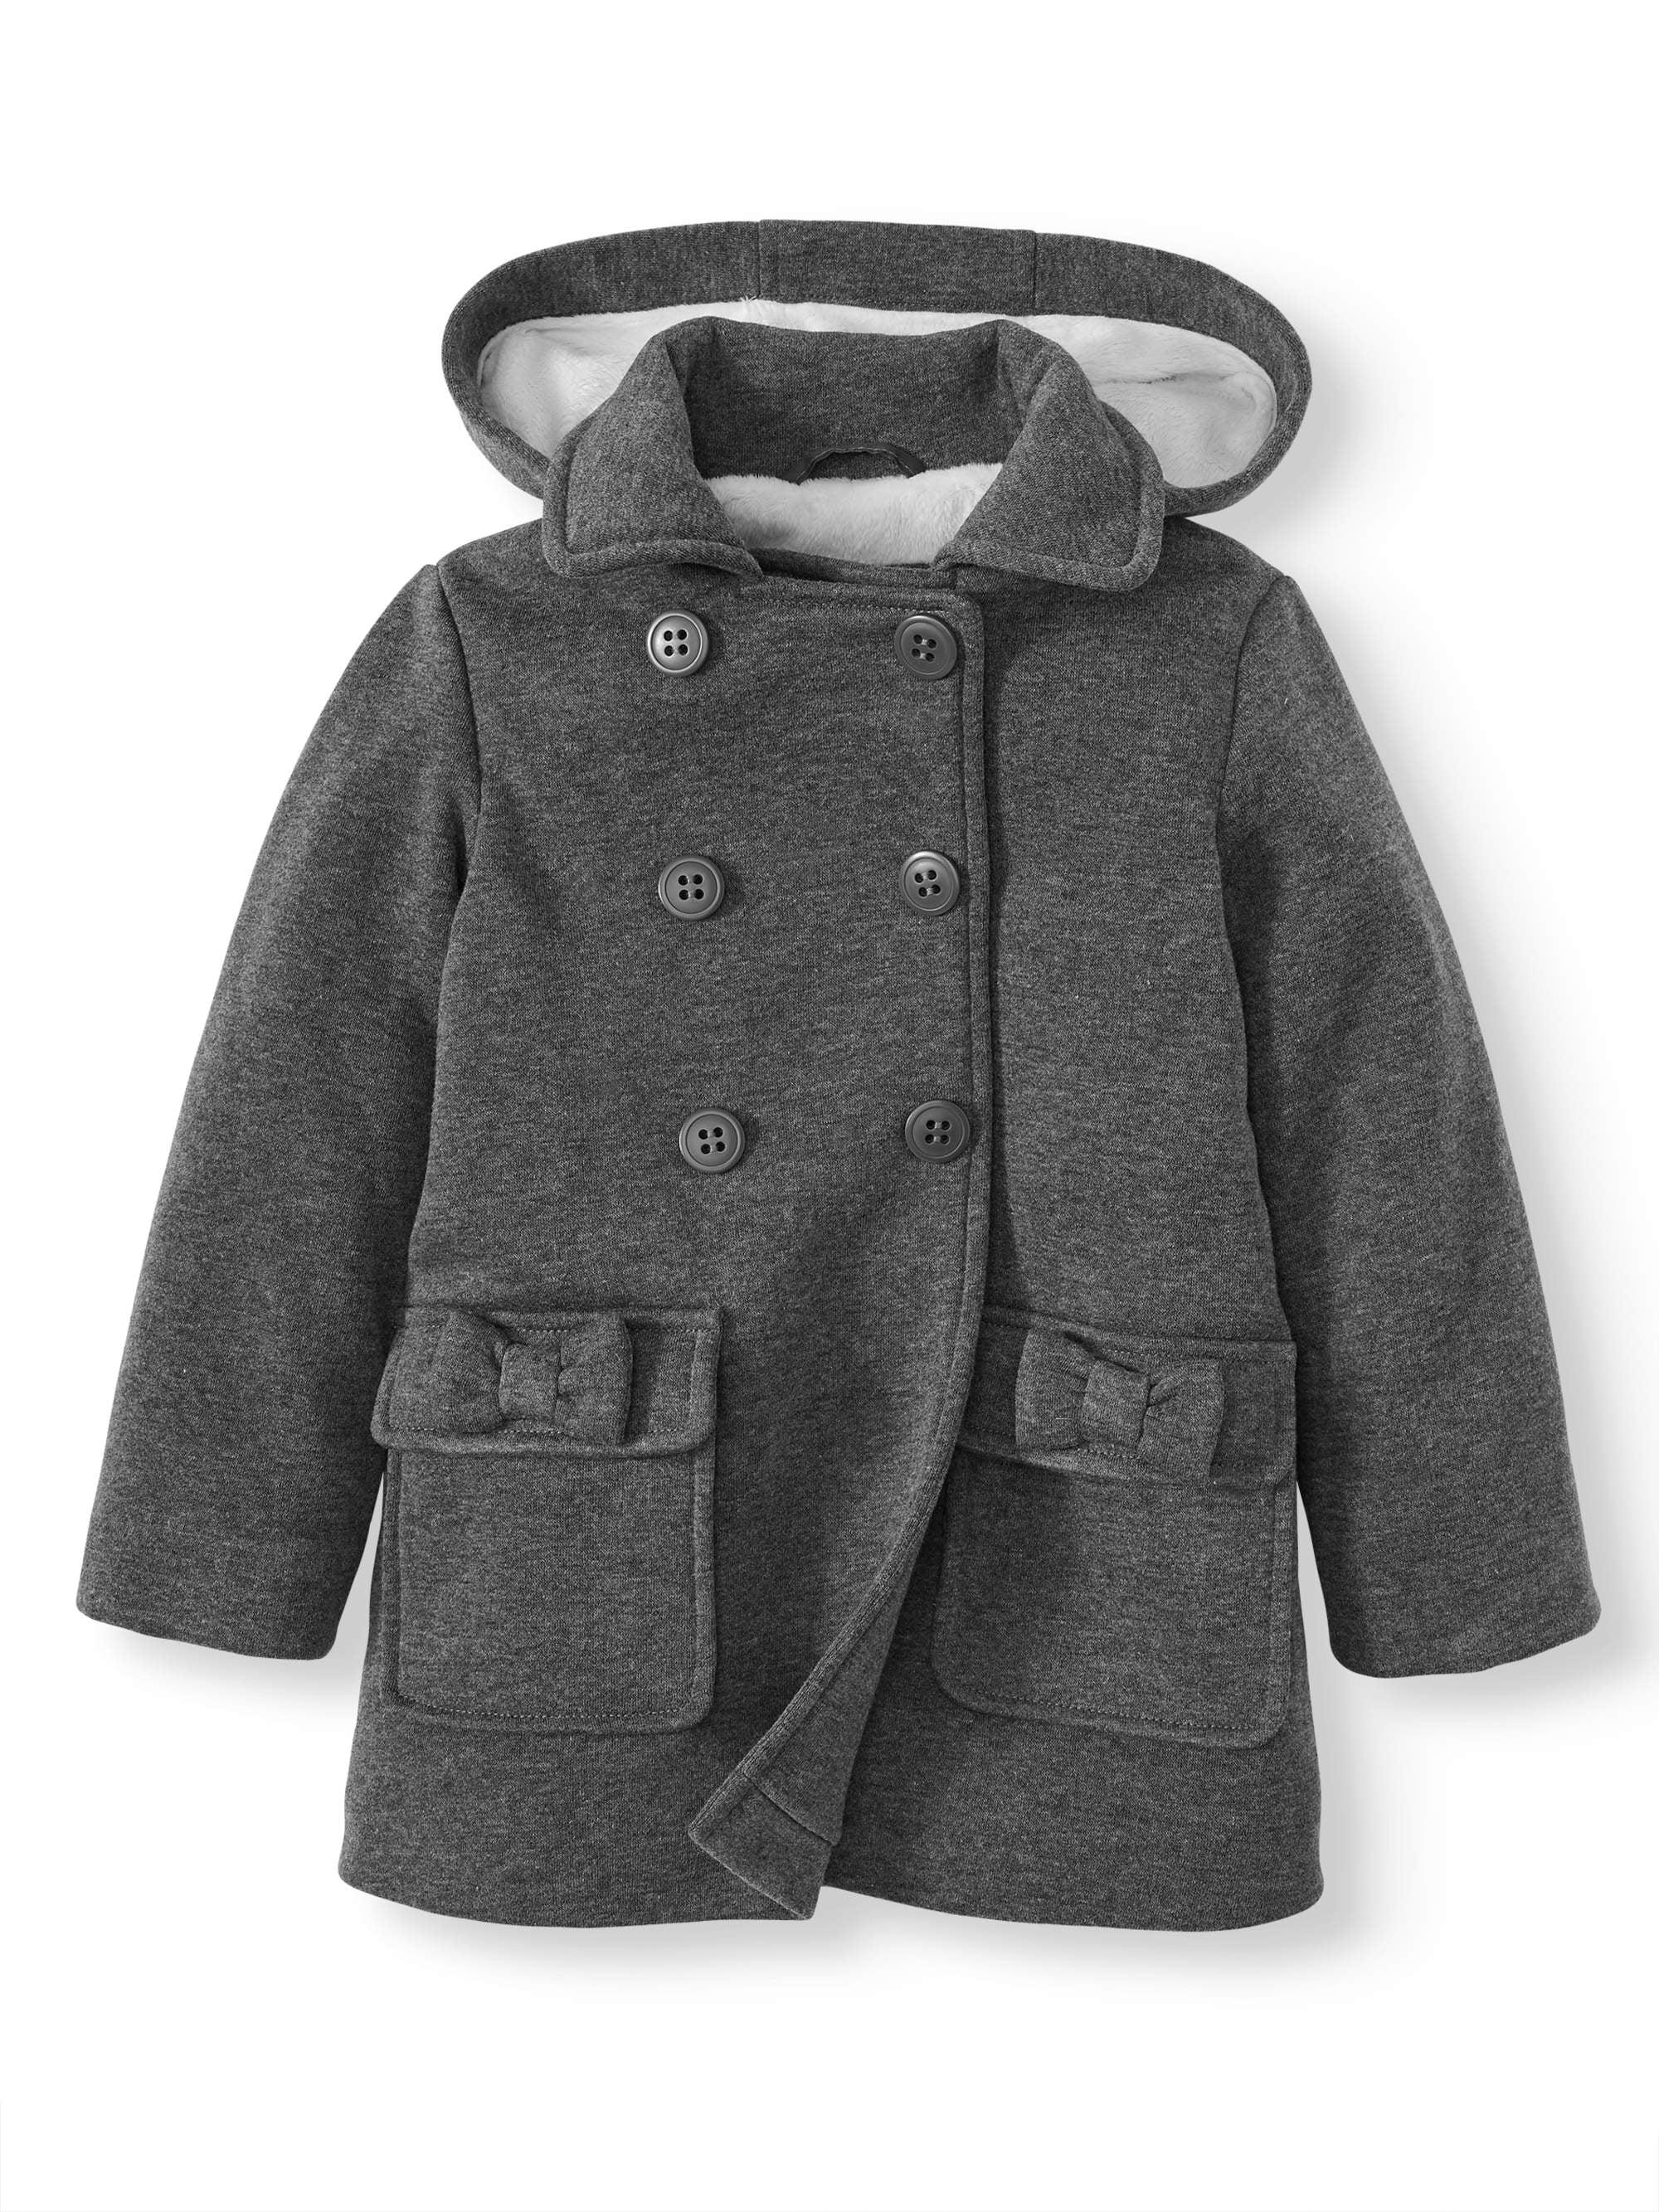 new york fashionablestyle sold worldwide BHIP - BHIP Baby Toddler Girl Double Bow Fleece Peacoat - Walmart.com